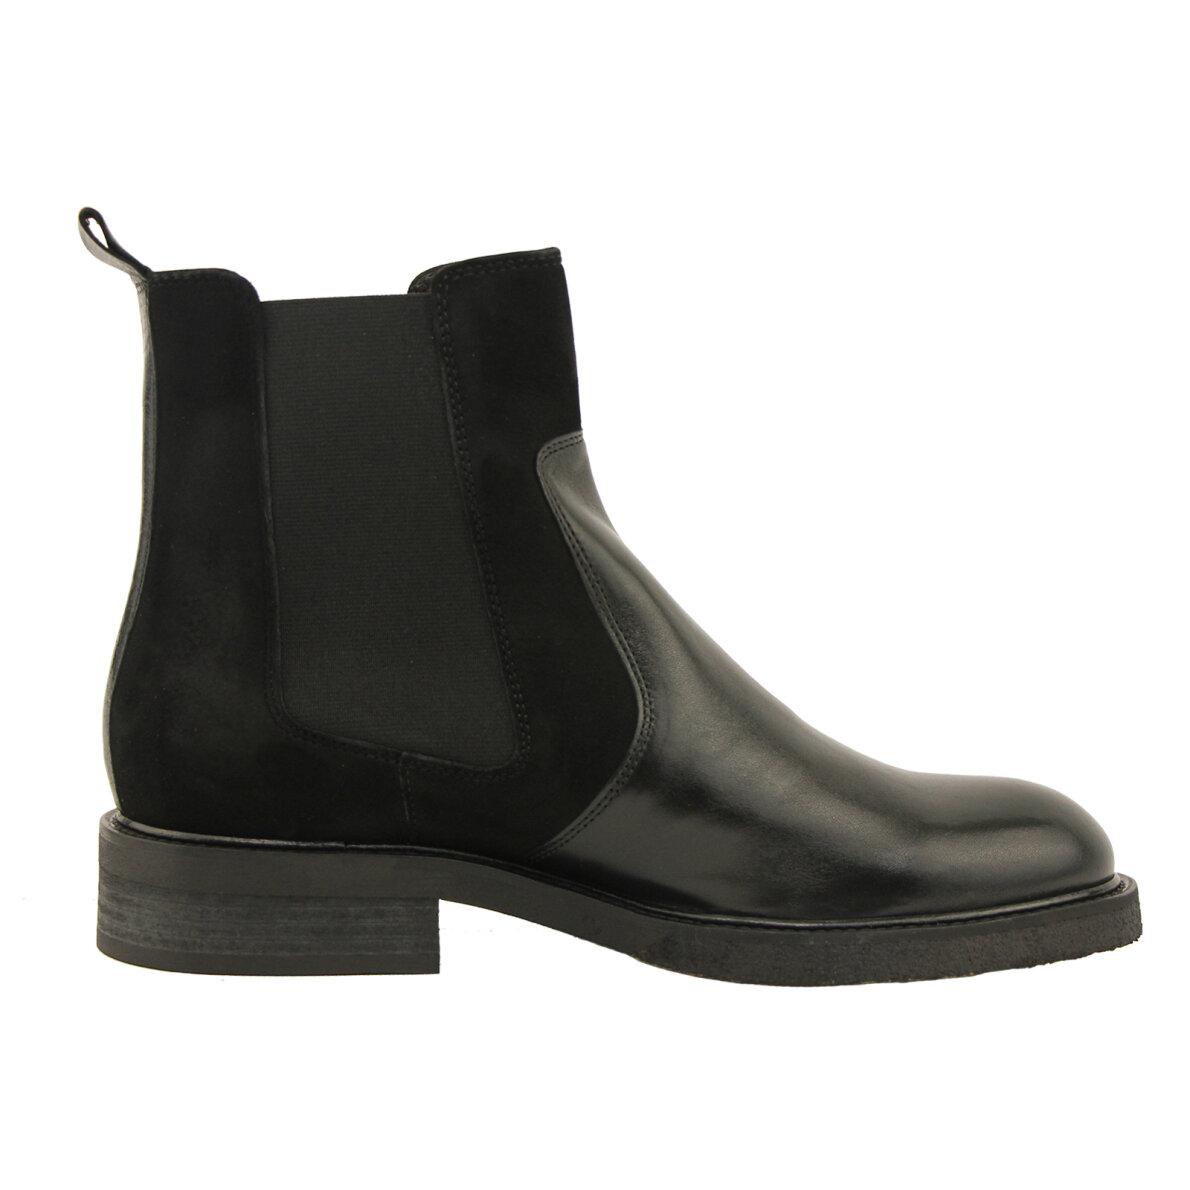 0fbf7a7b ... Billi Bi - Billi Bi 7424 Sort Chelsea Støvle i skind og ruskind ...